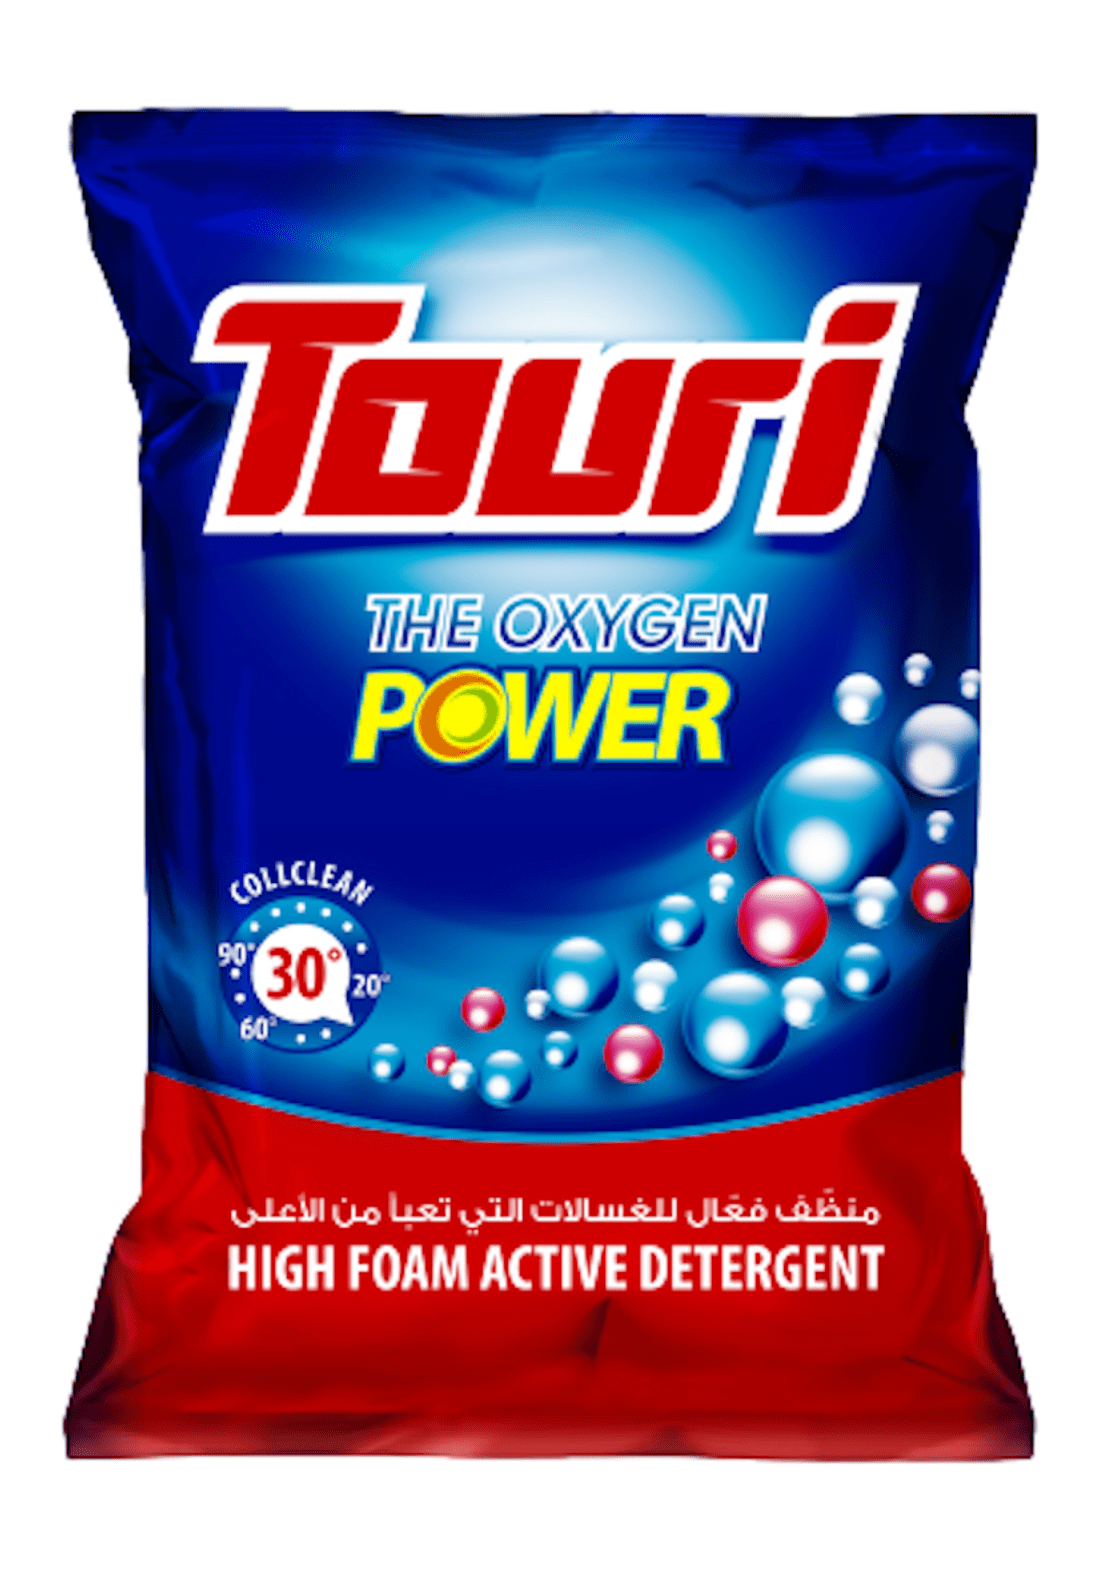 Touri washing powder 3 kg مسحوق غسيل طوري 3 كغم